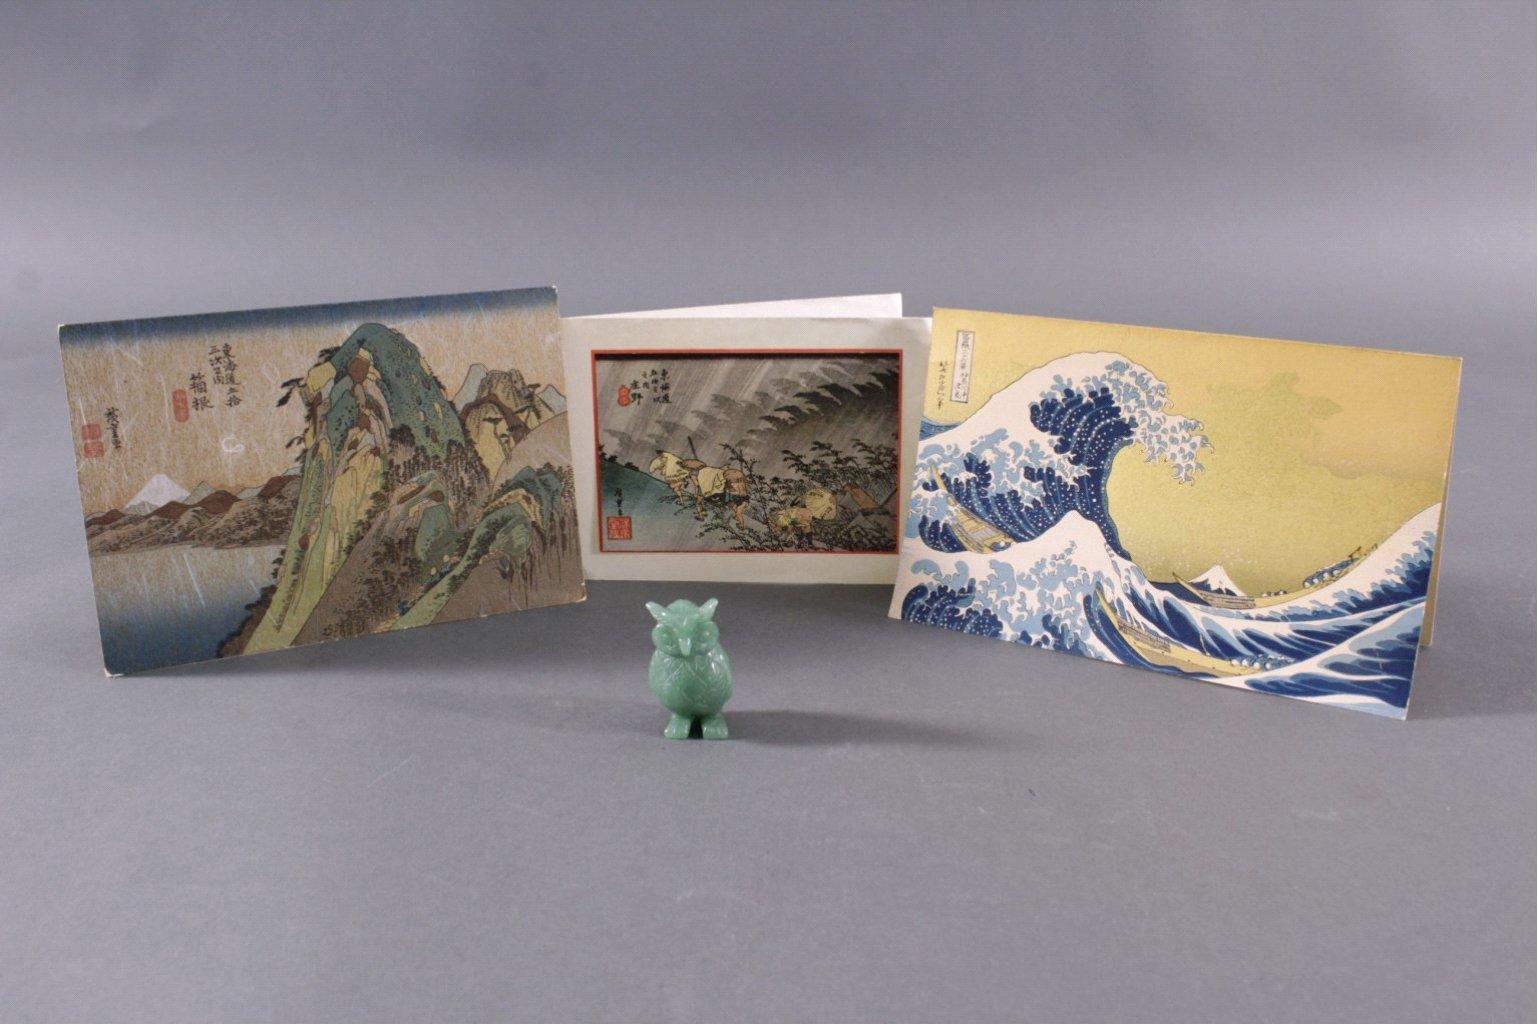 Jadeeule und Japanische Kunstdrucke